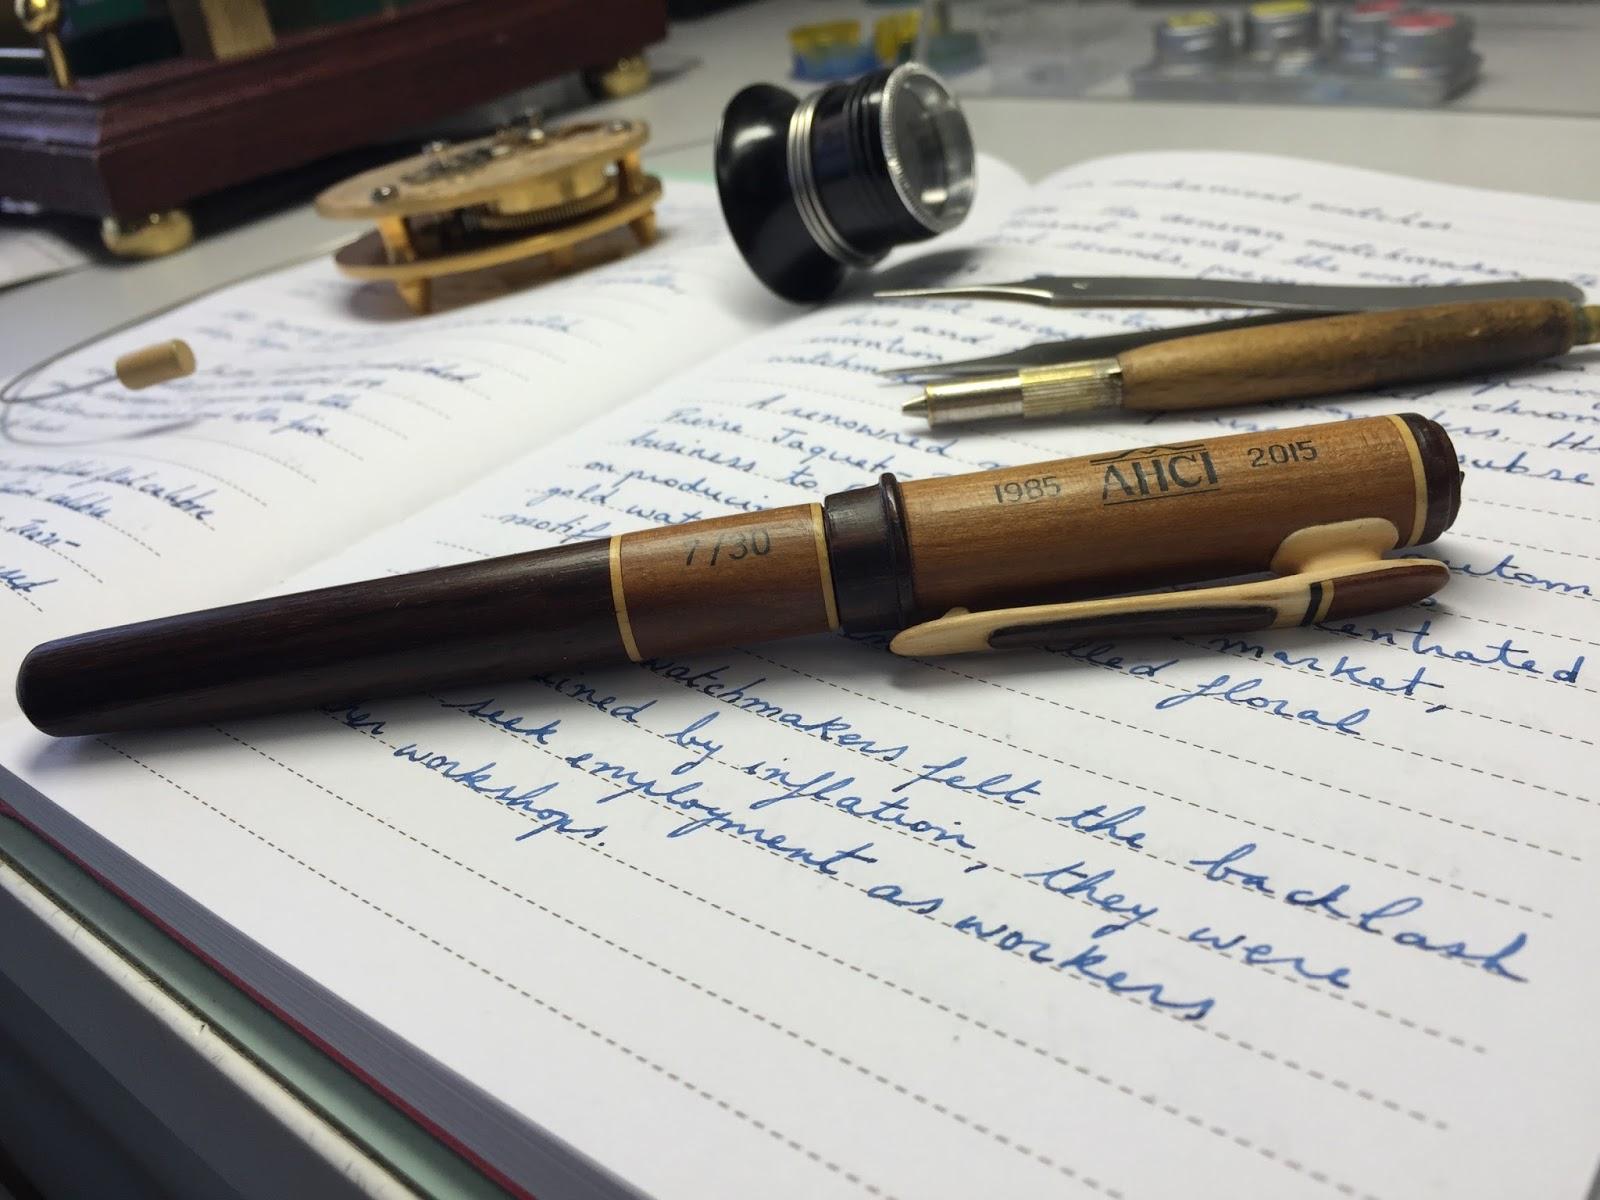 AHCI-30th-Anniversary-pen-7